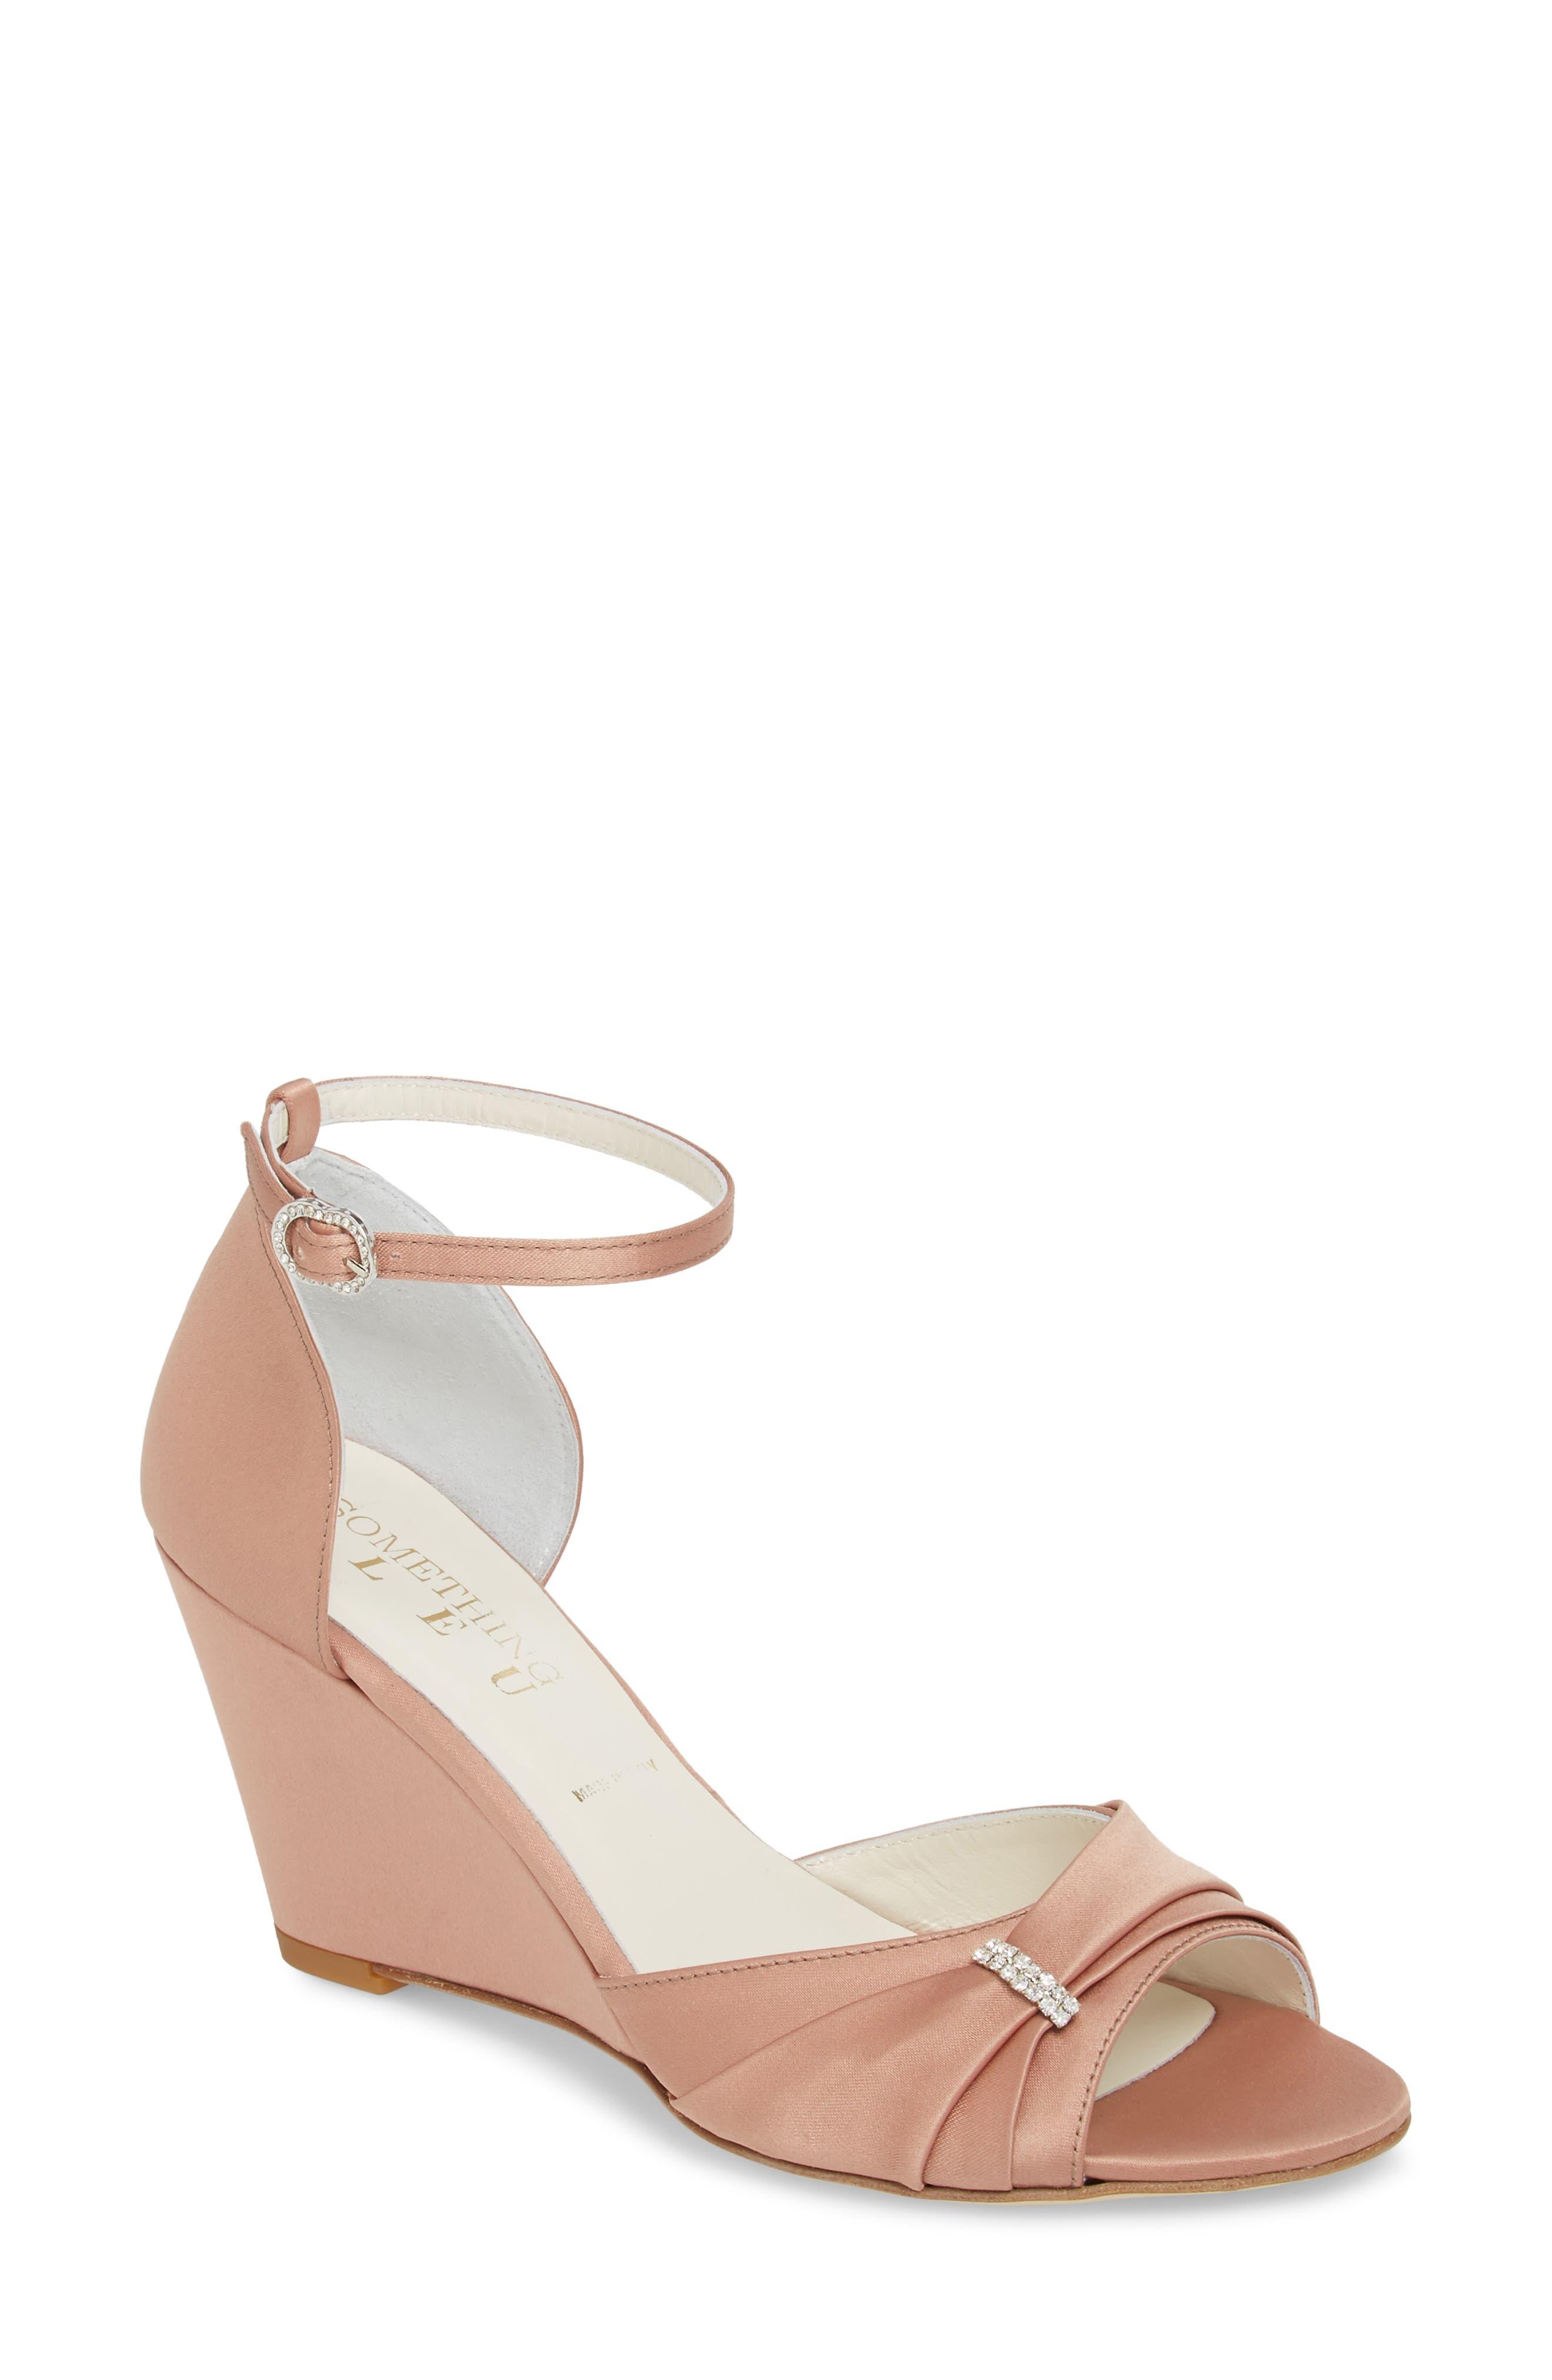 Queenie Ankle Strap Wedge Sandal,                         Main,                         color, Blush Satin